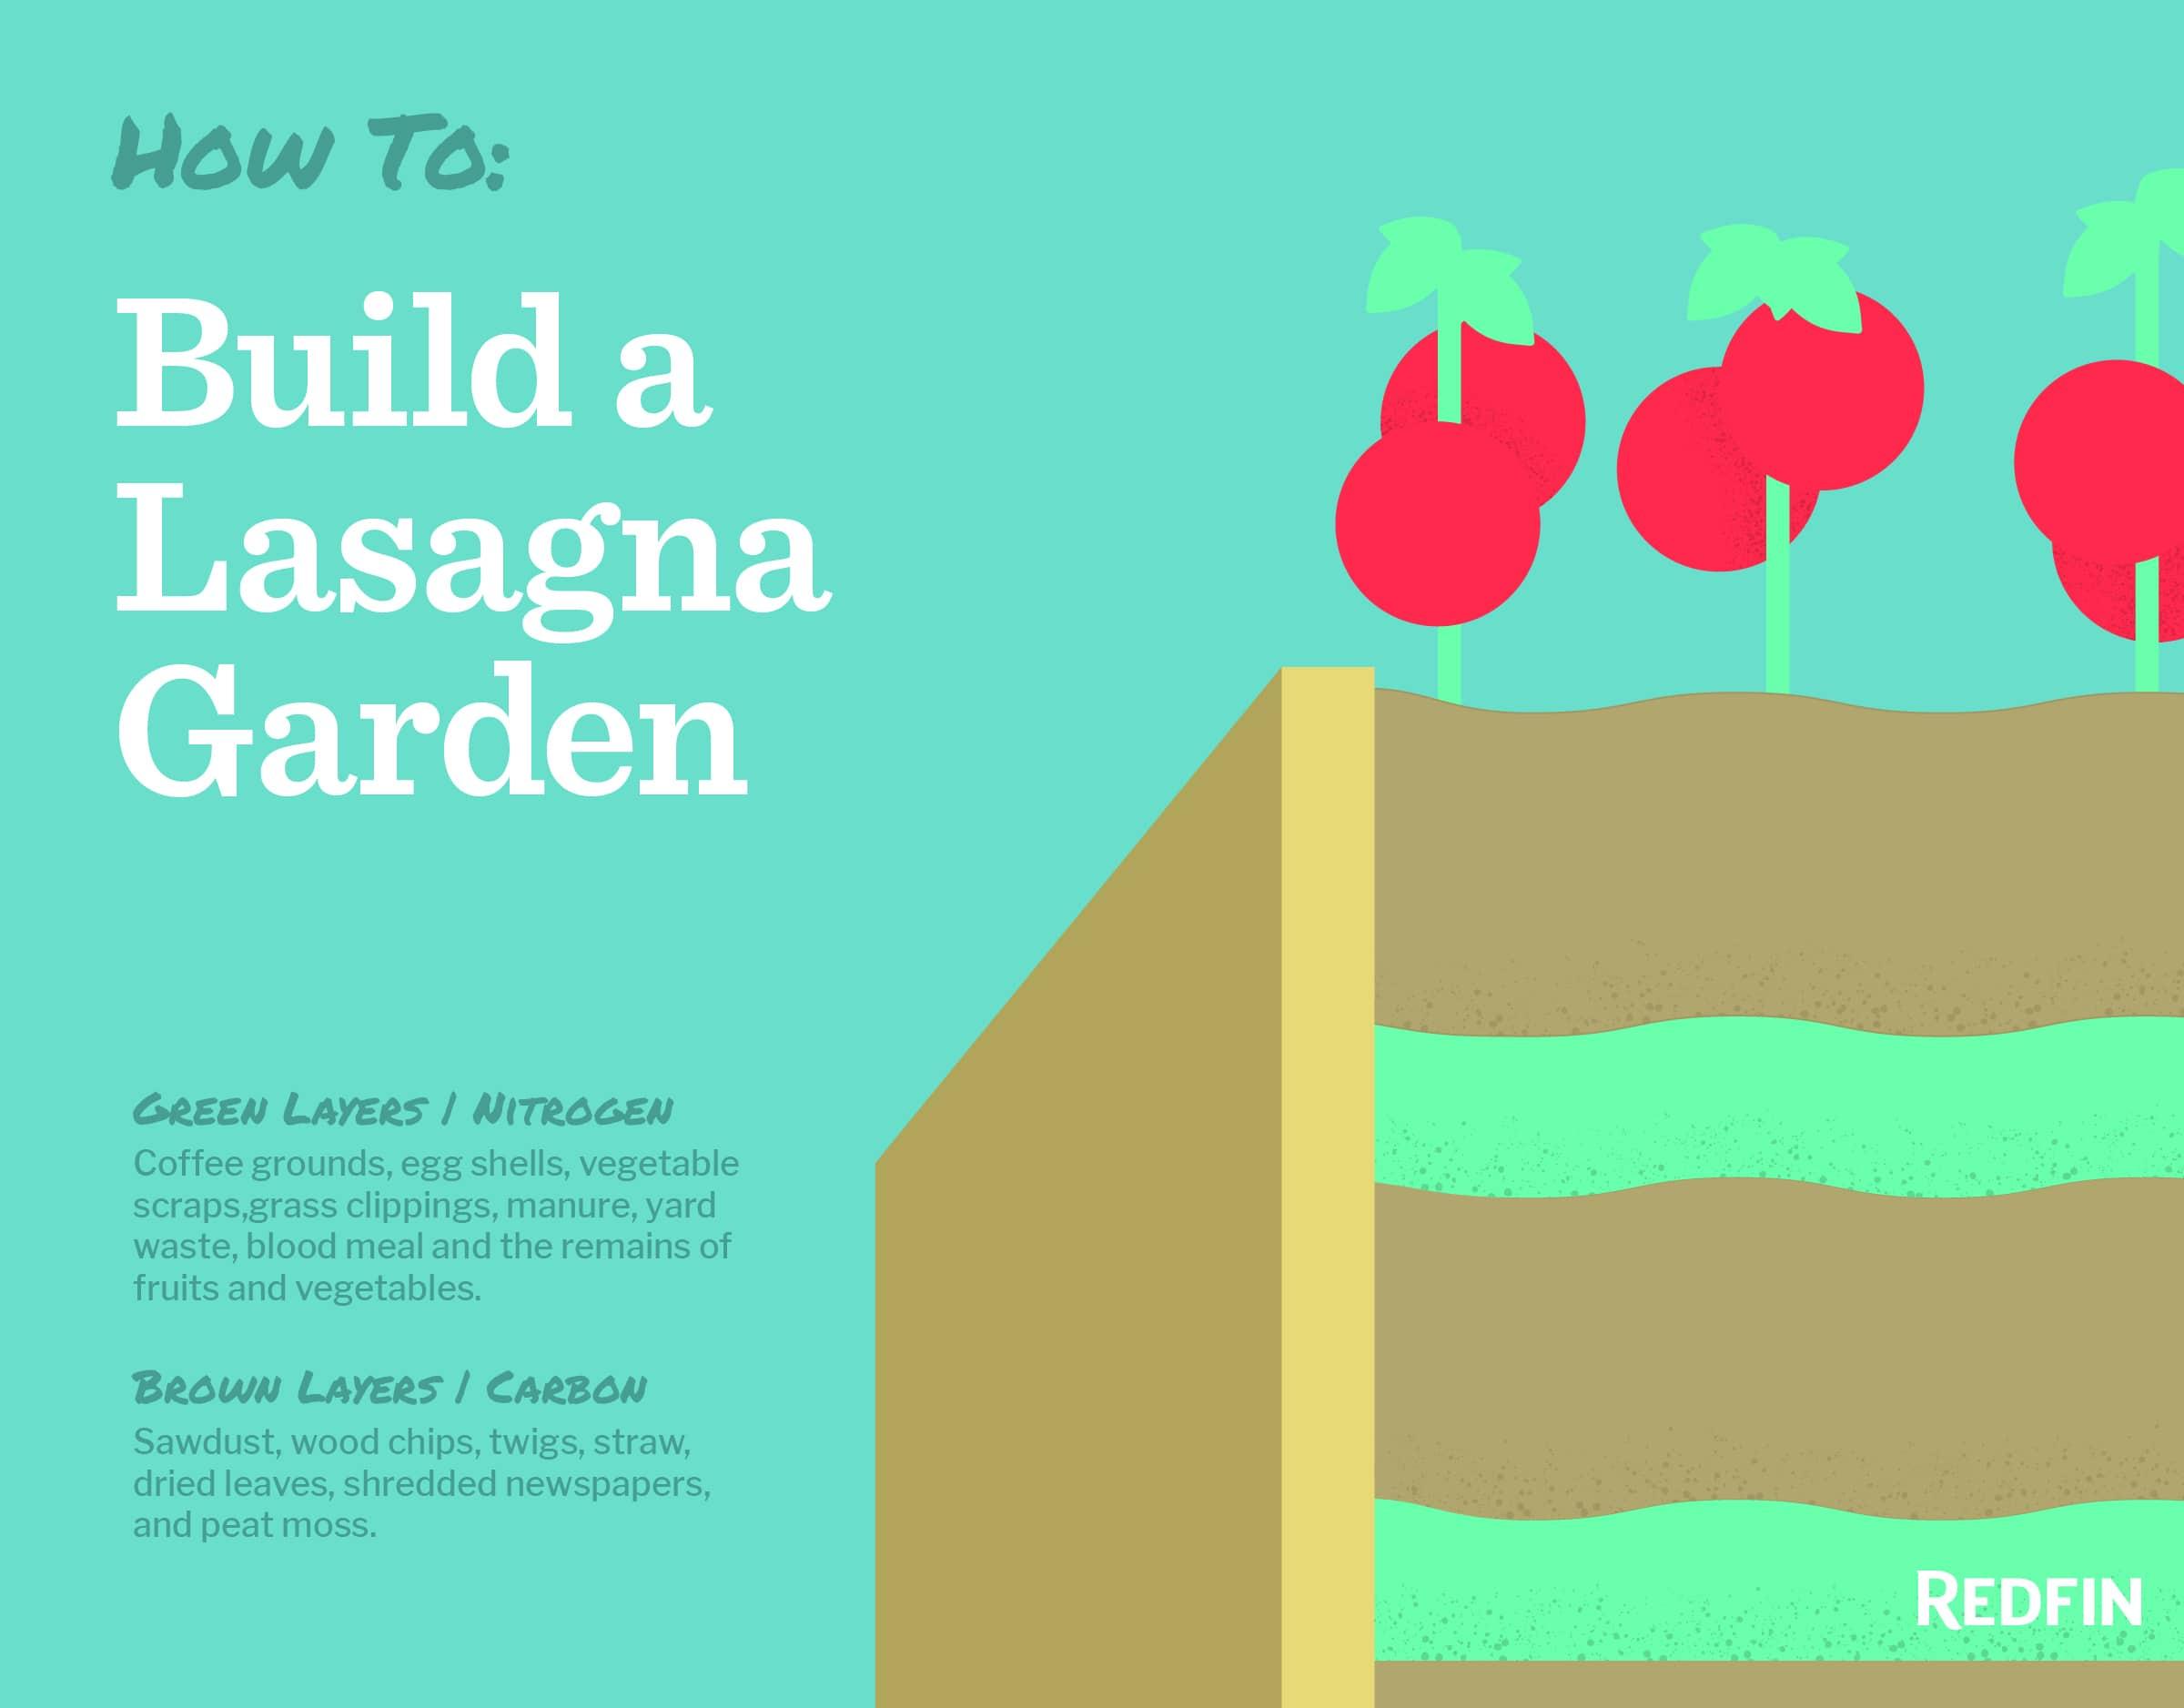 Lasagna gardening primer